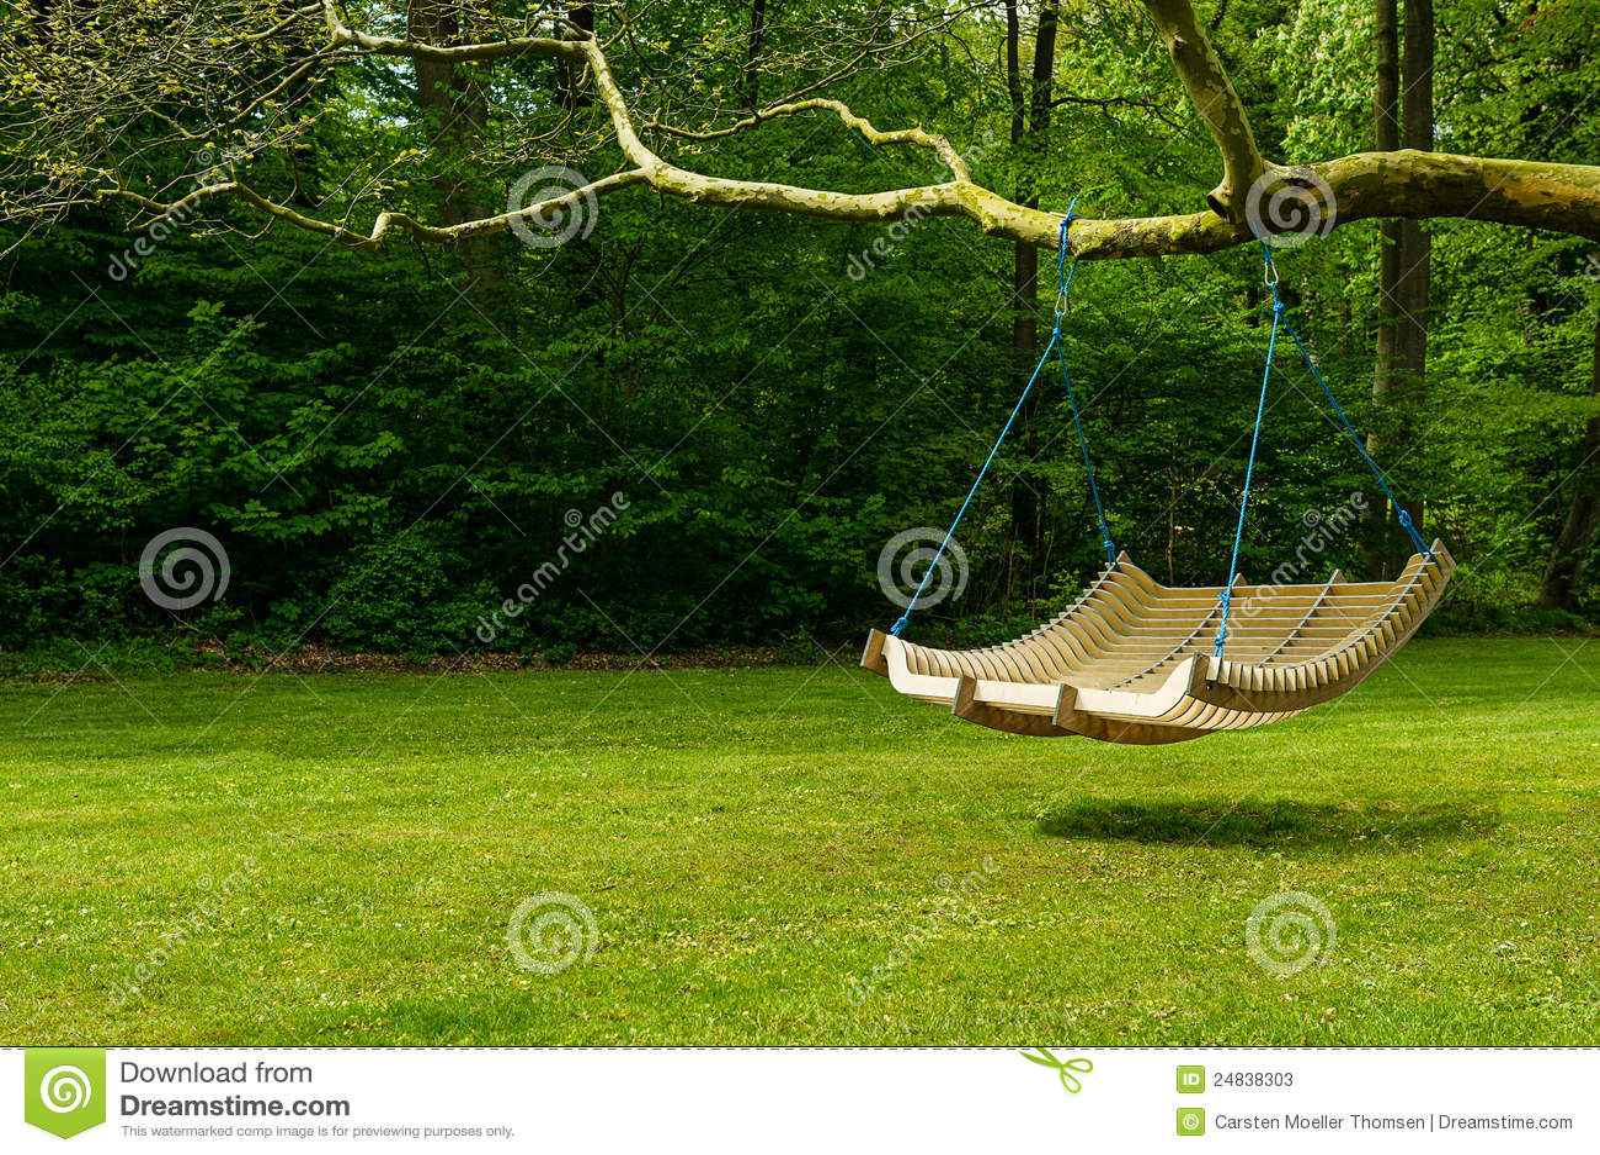 Swing Bench In Lush Garden Stock Image Of Informal